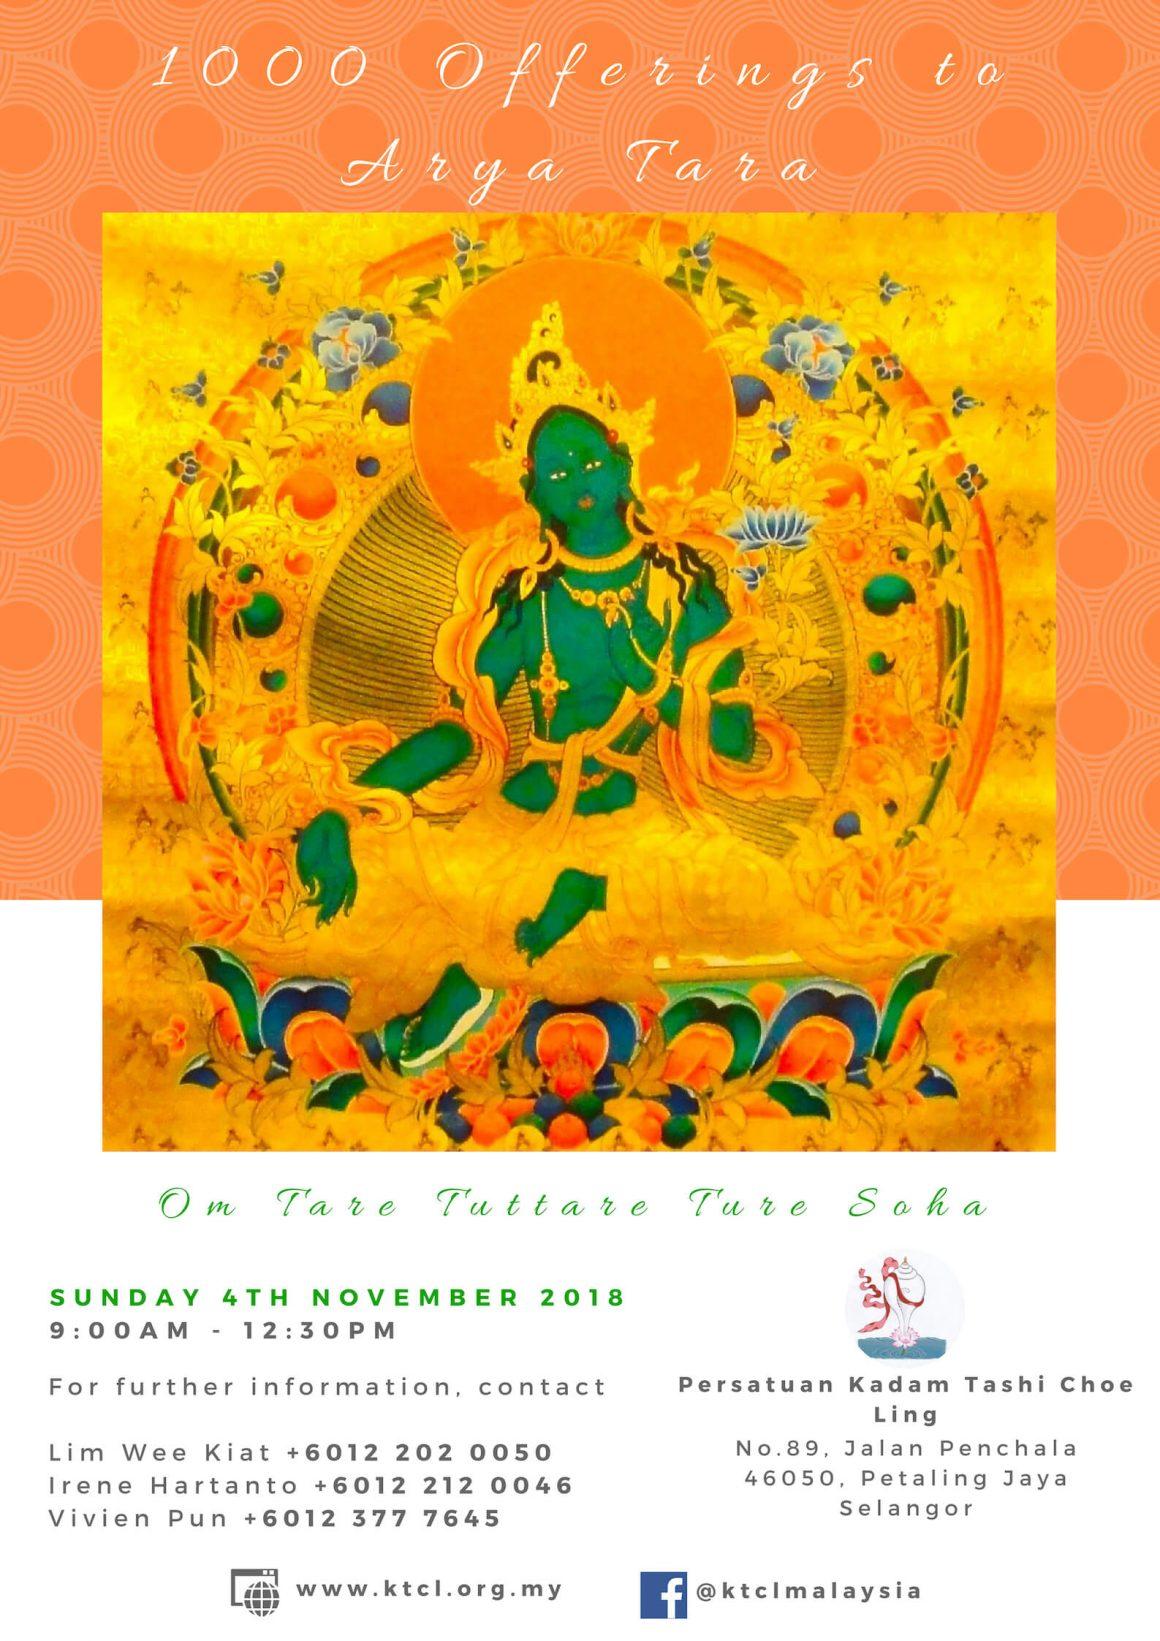 1000 Offerings to Arya Tara